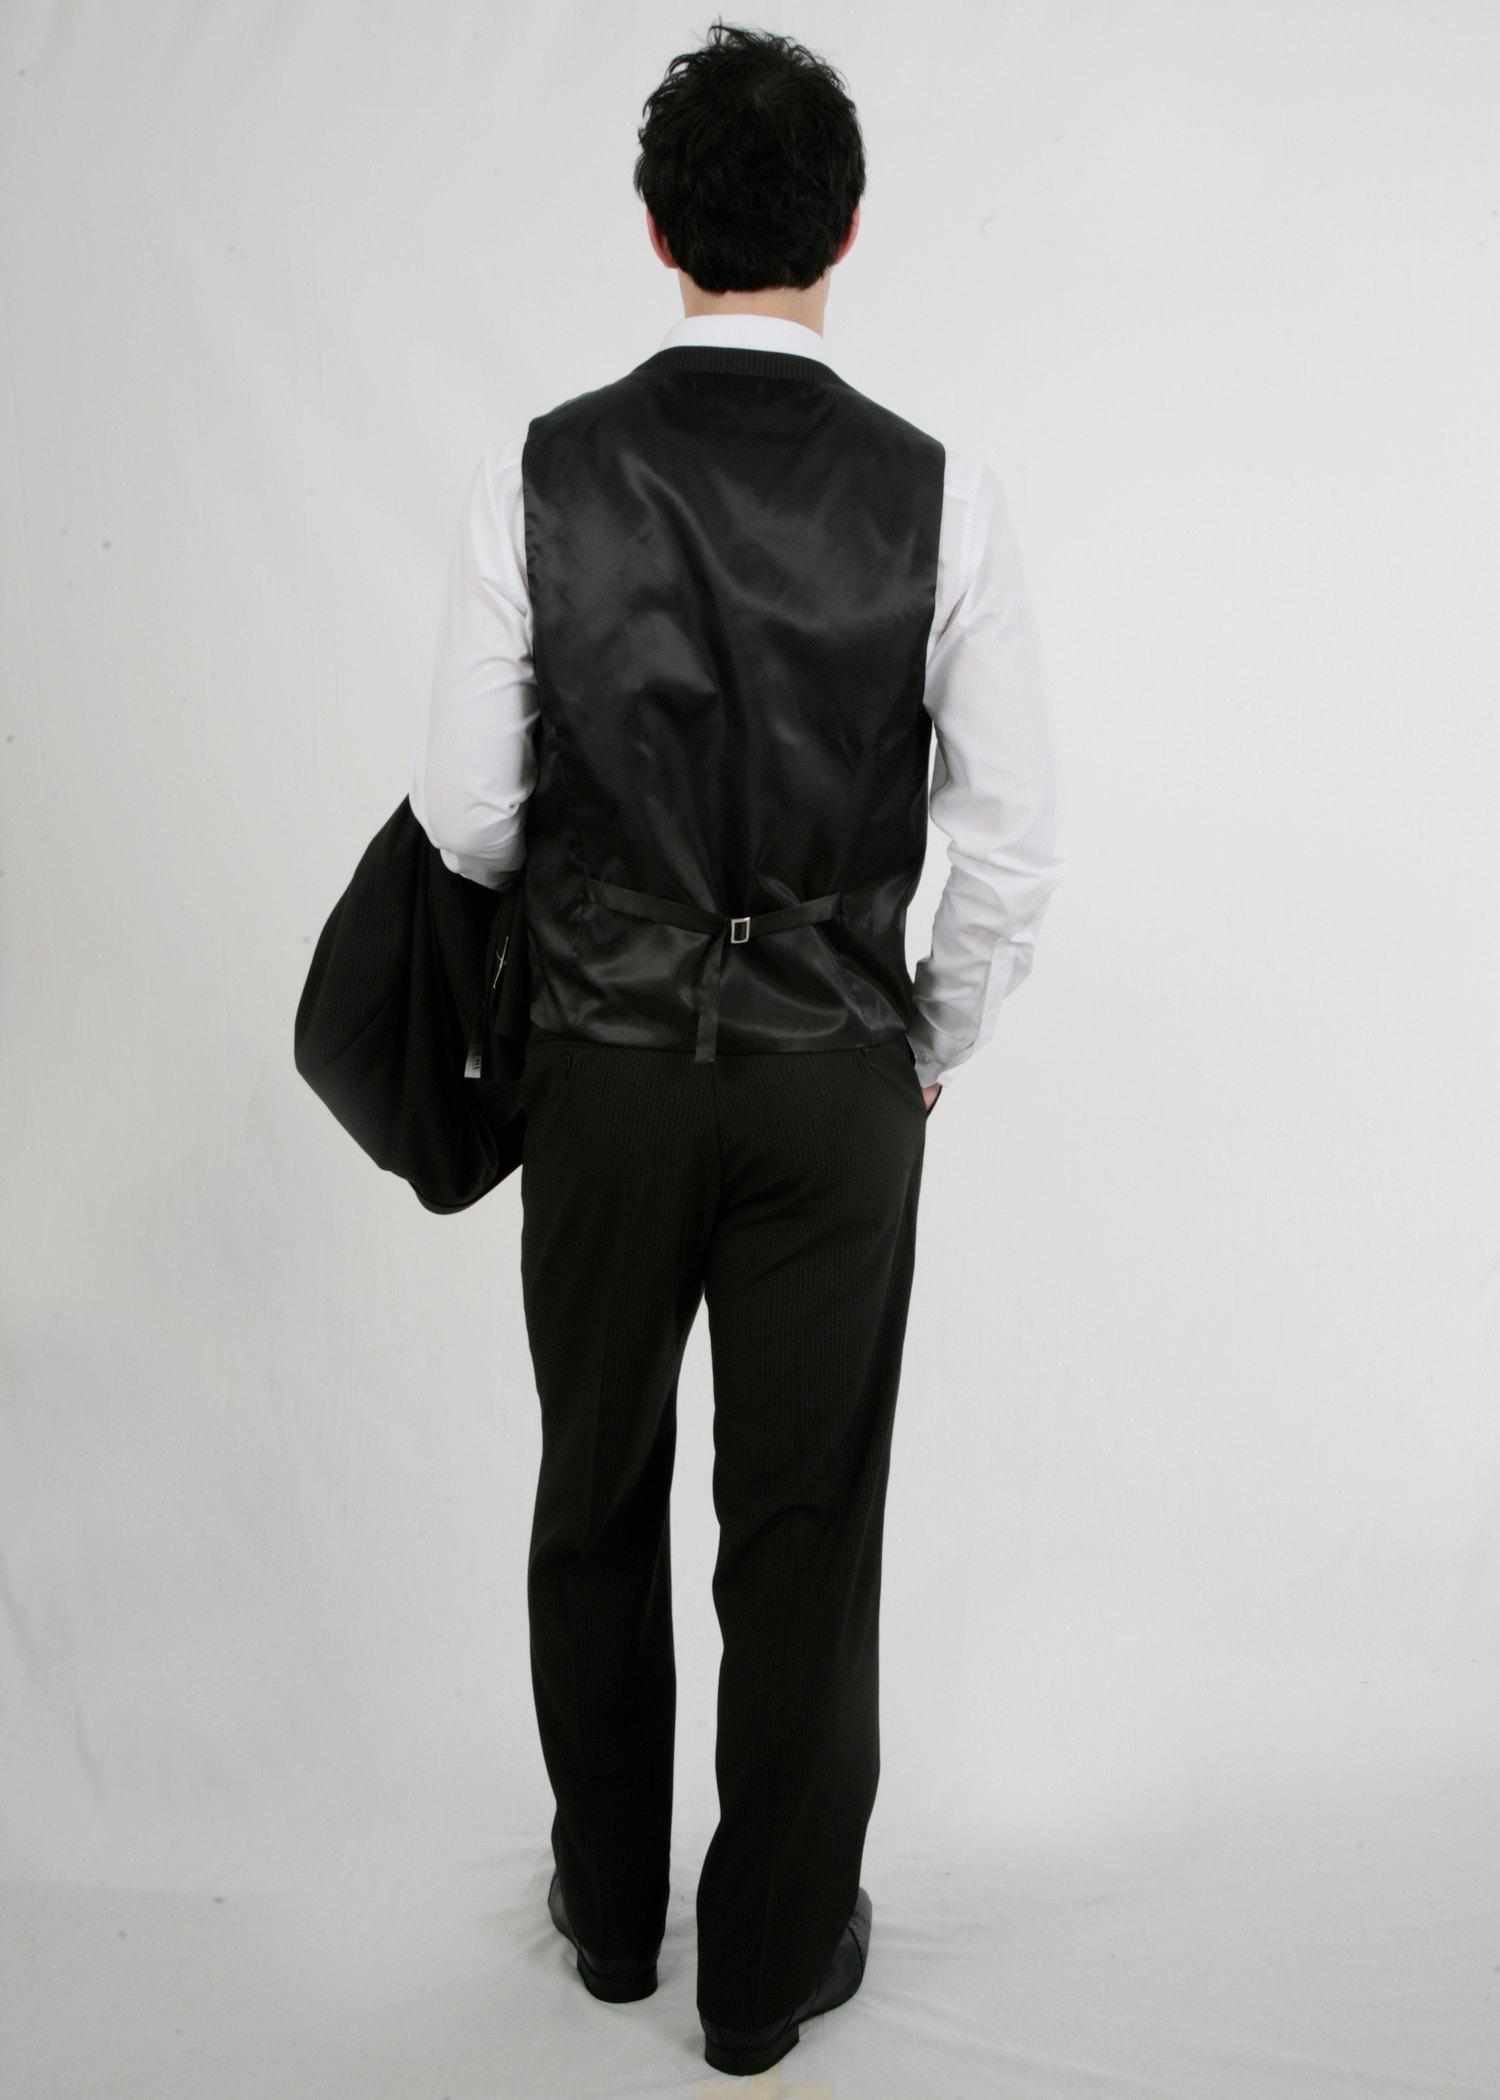 Pinstripe black waistcoat